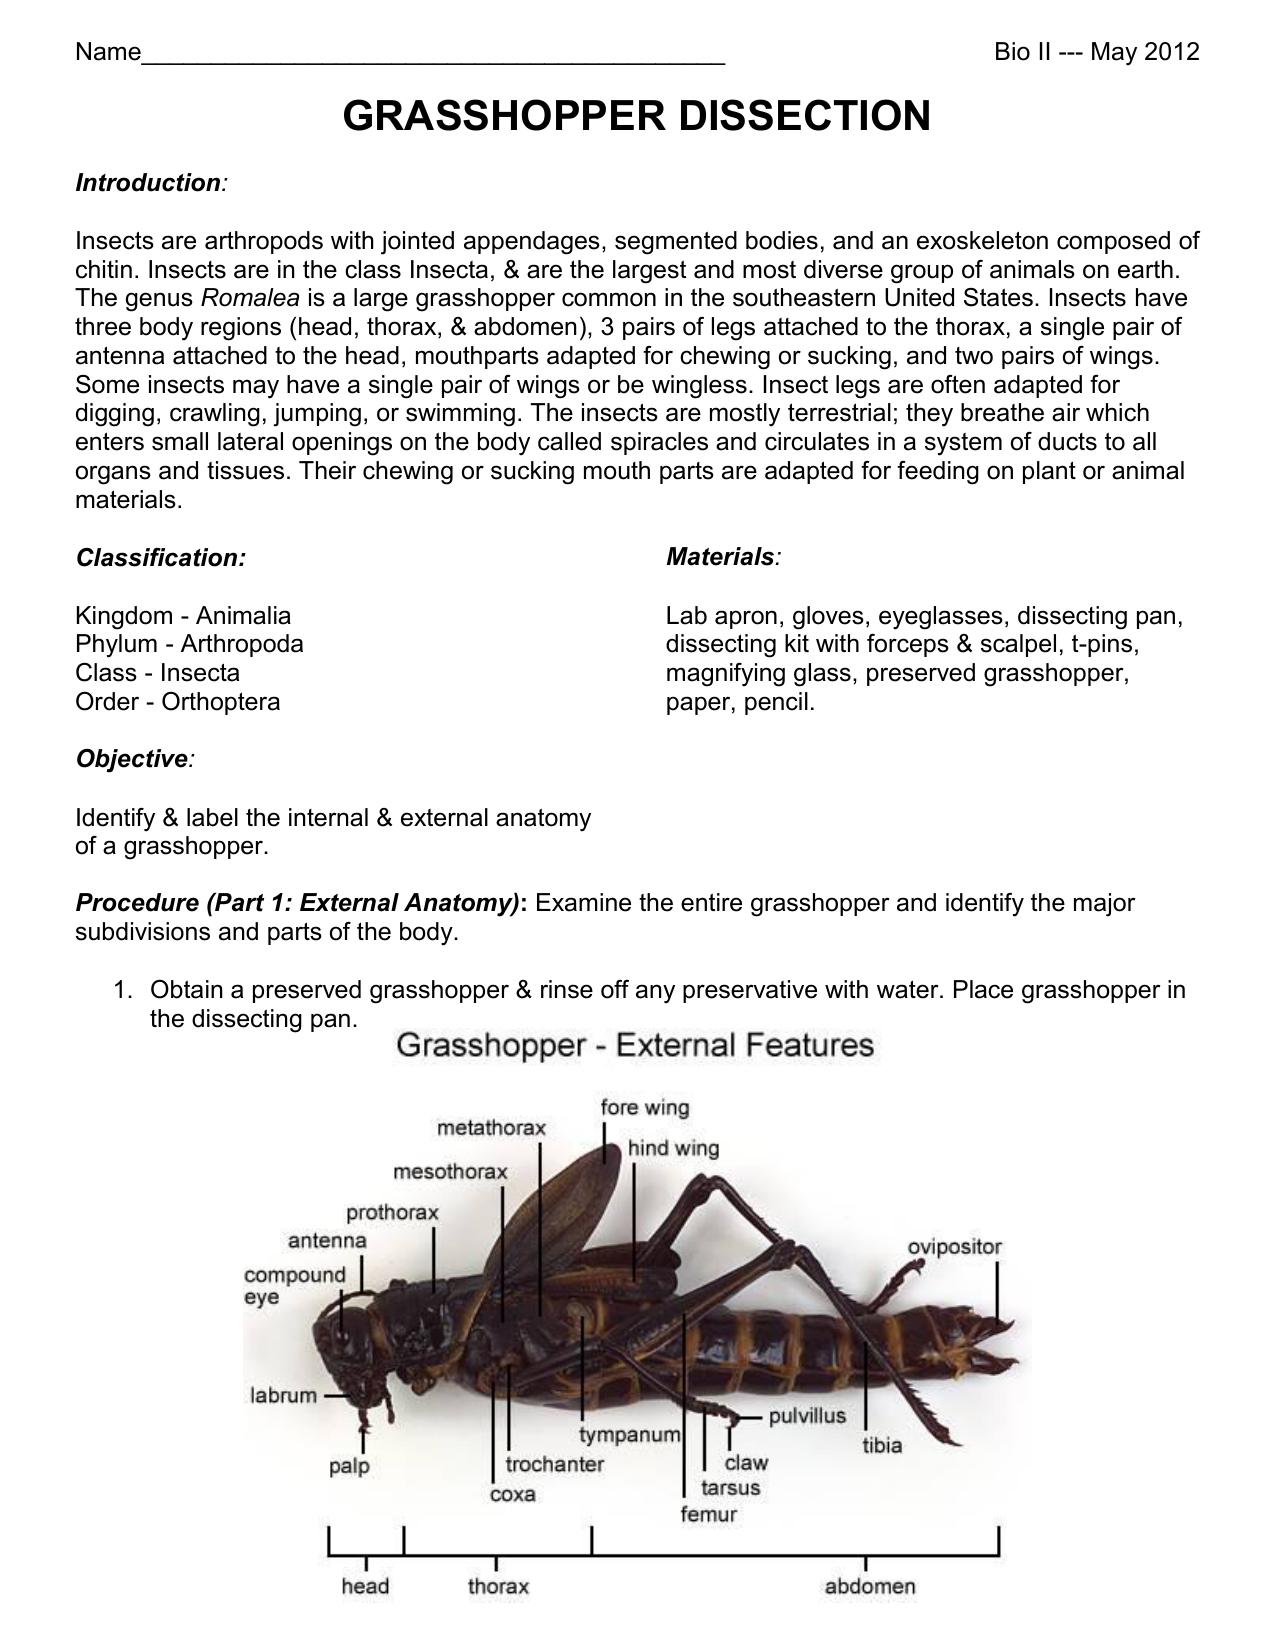 grasshopper dissection - Hamilton Local Schools